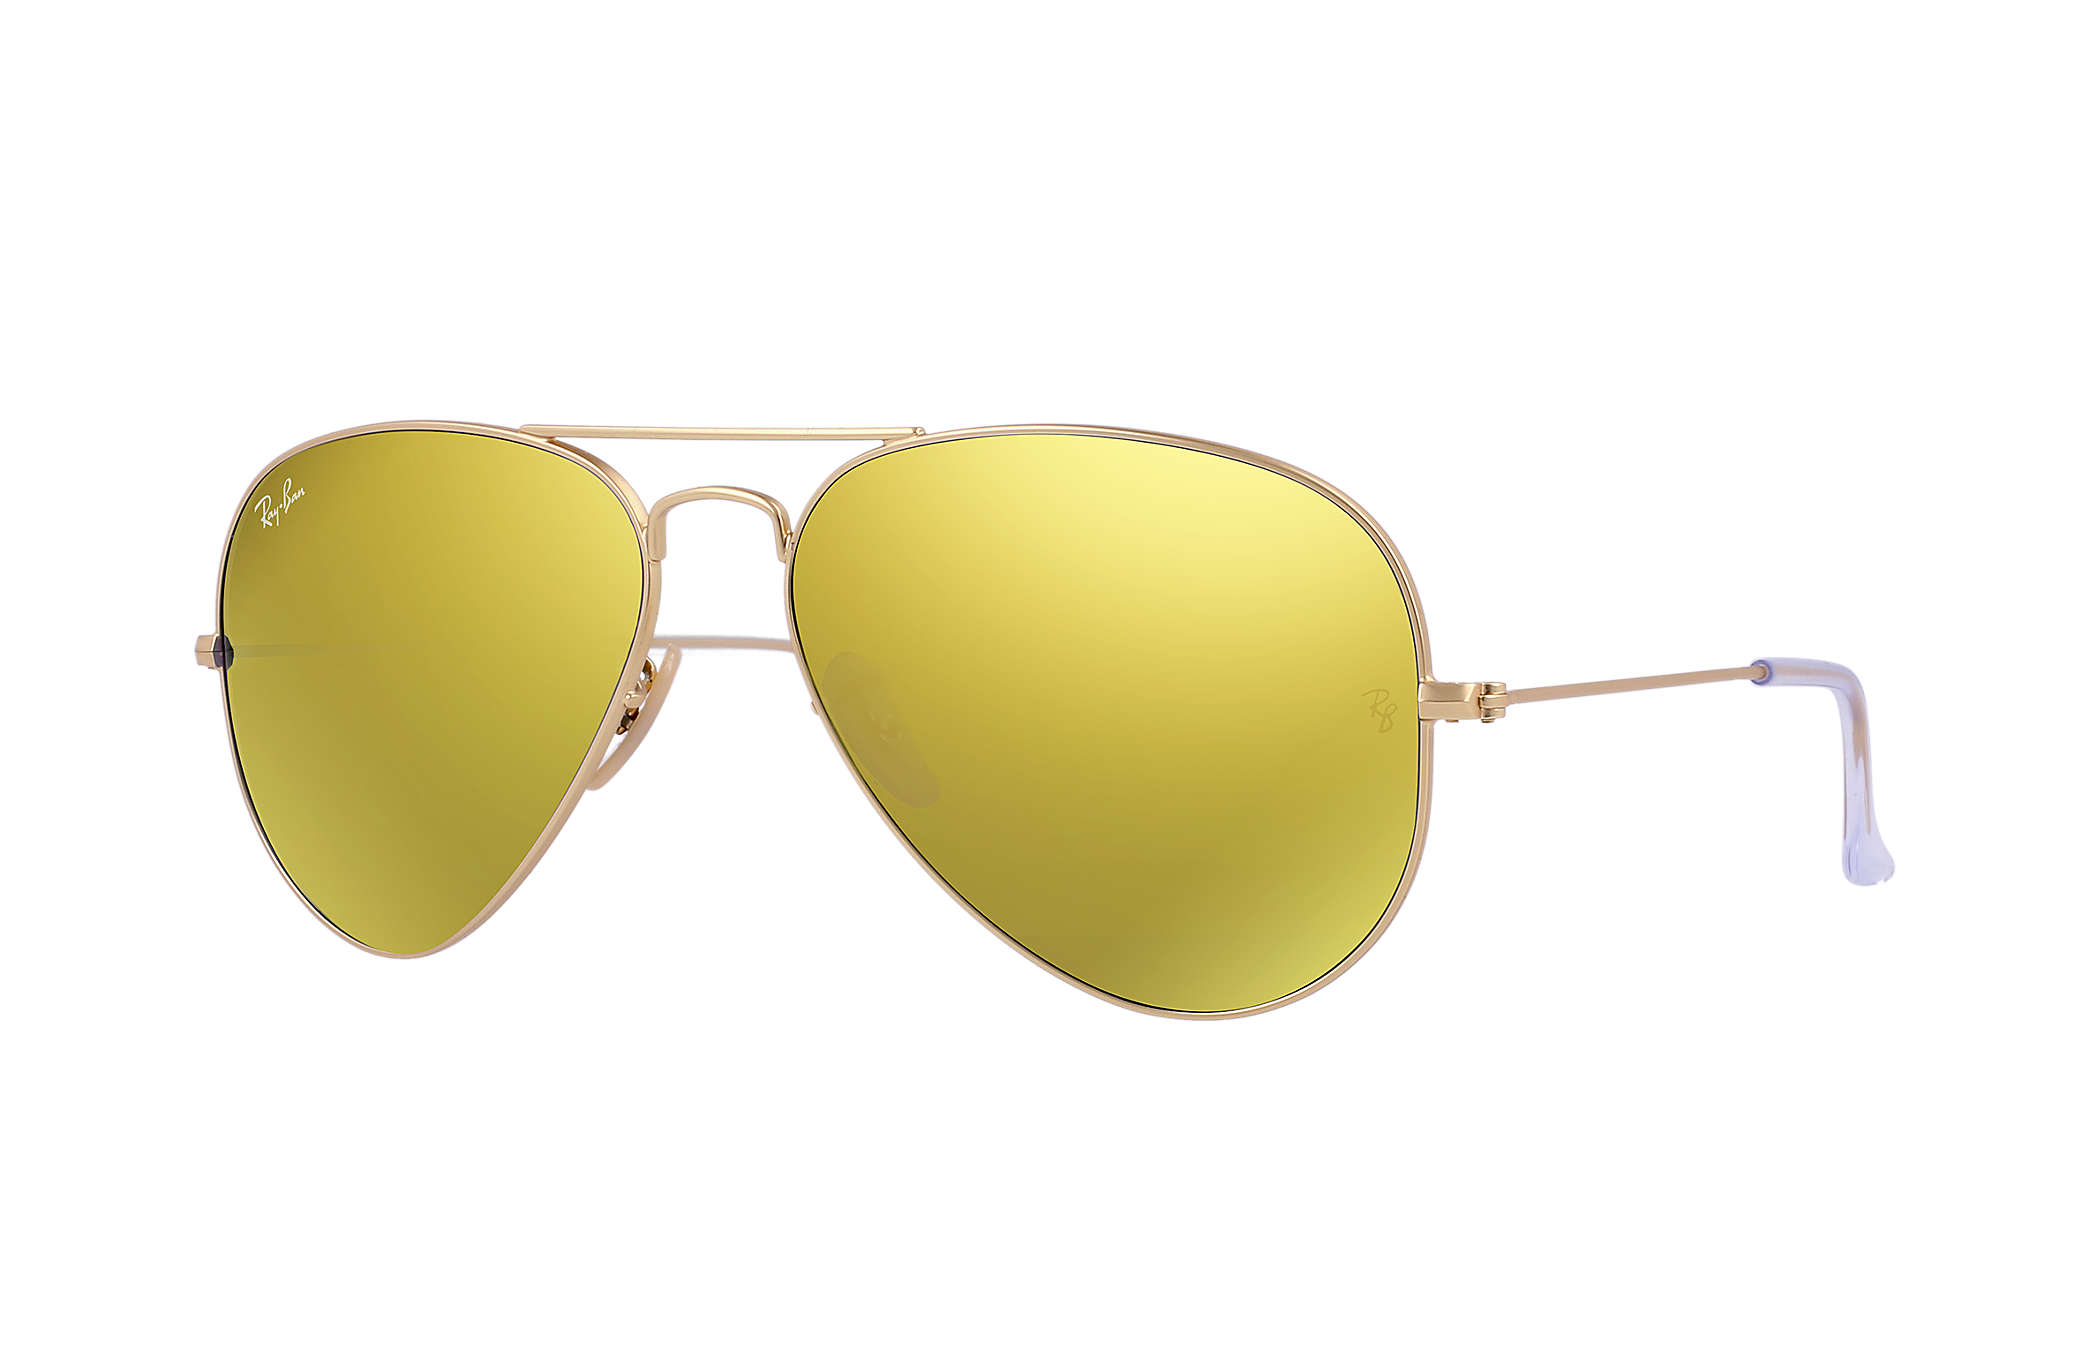 41fe697b66 Ray-Ban Aviator Flash Lenses RB3025 Gold - Metal - Yellow Lenses ...